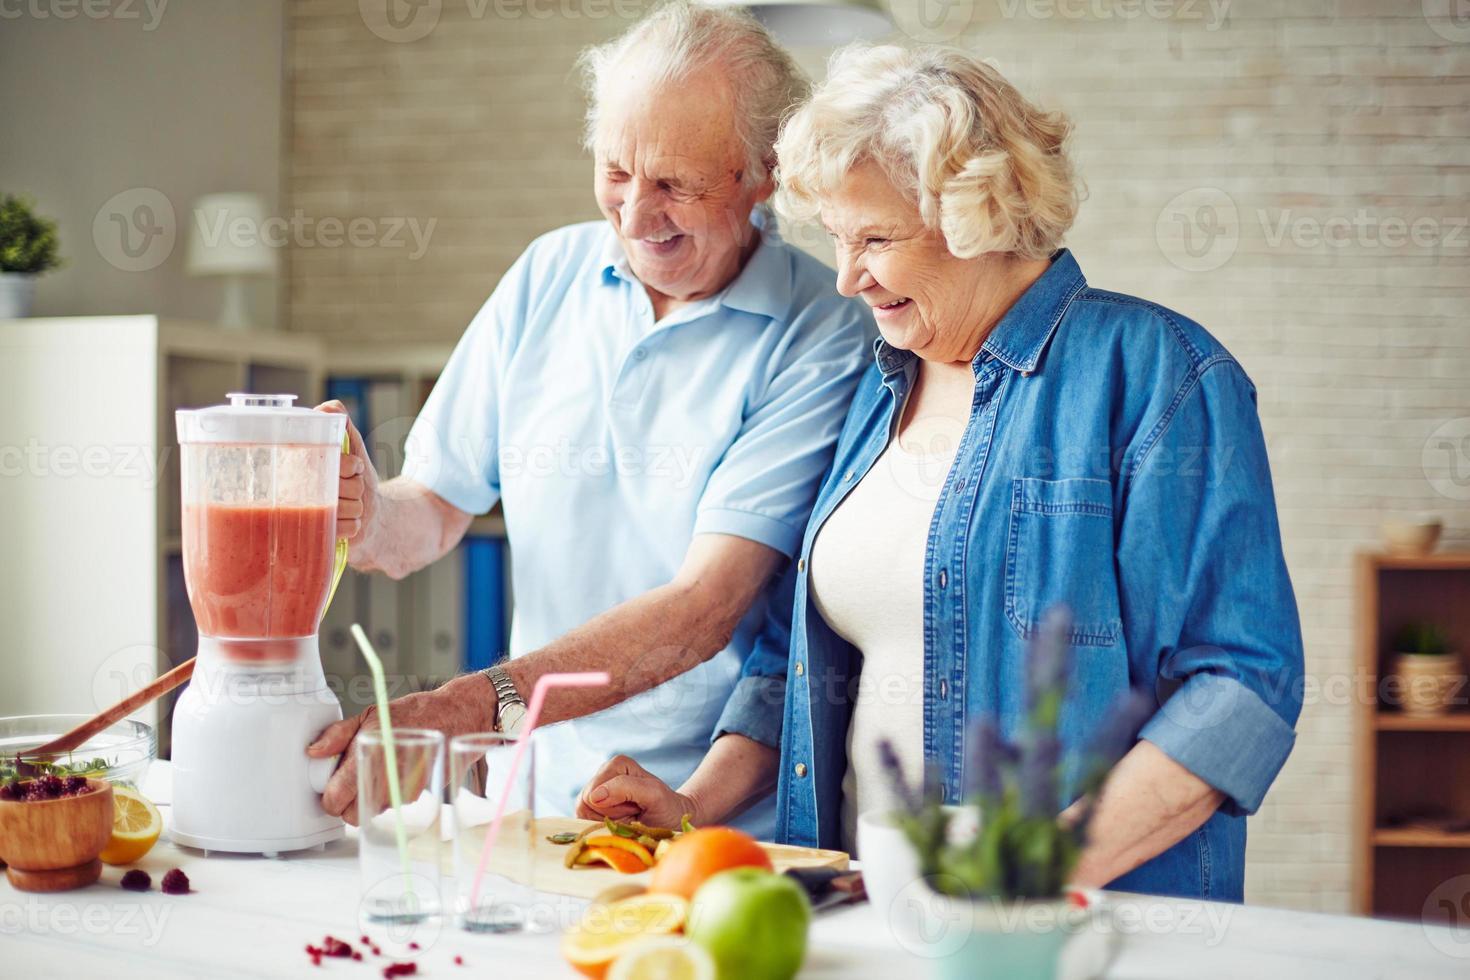 Seniors in the kitchen photo